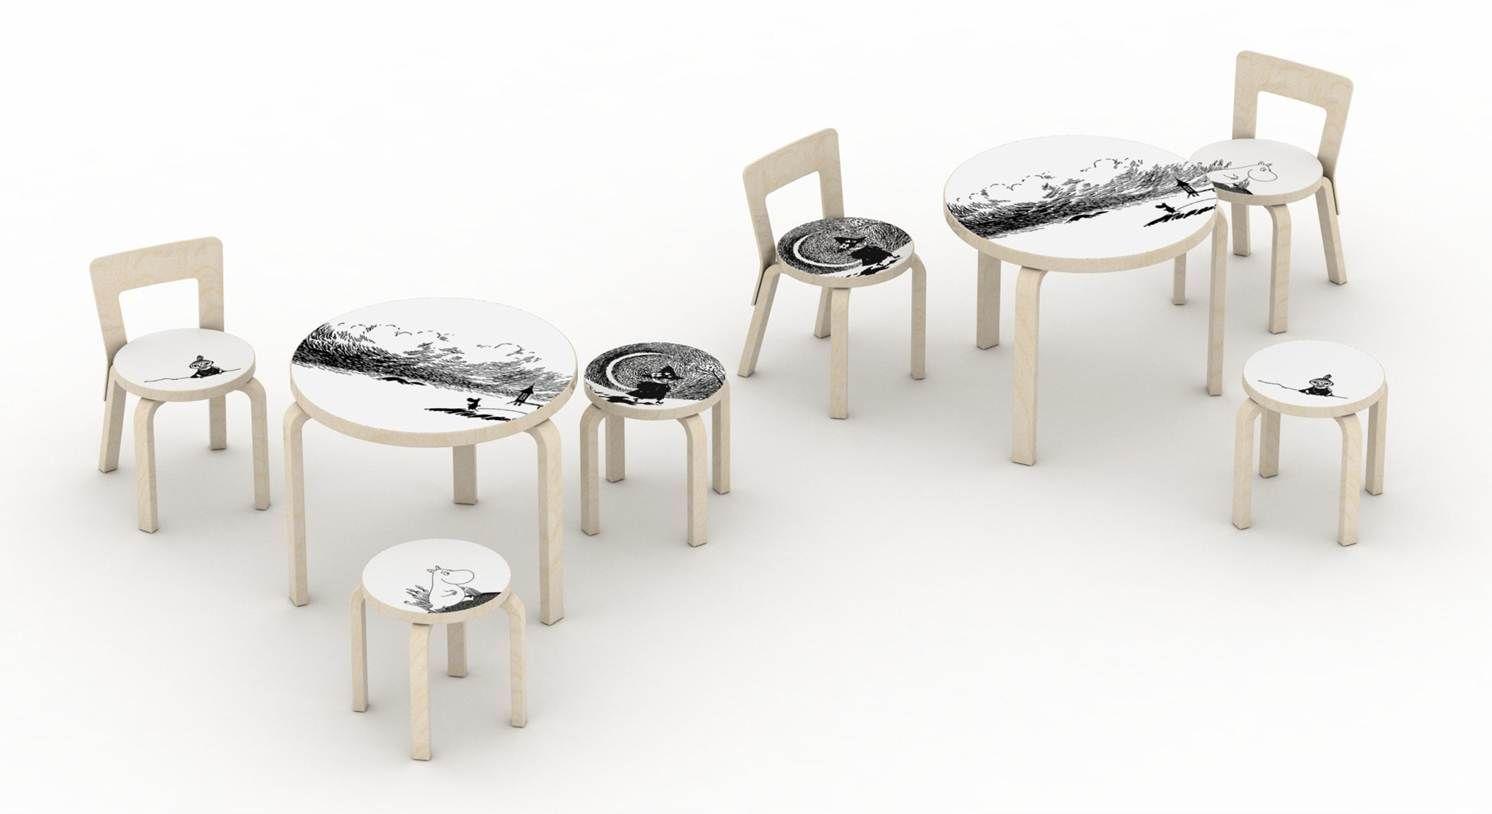 The beloved Moomins begin new adventures on Artek's Classic Furniture!